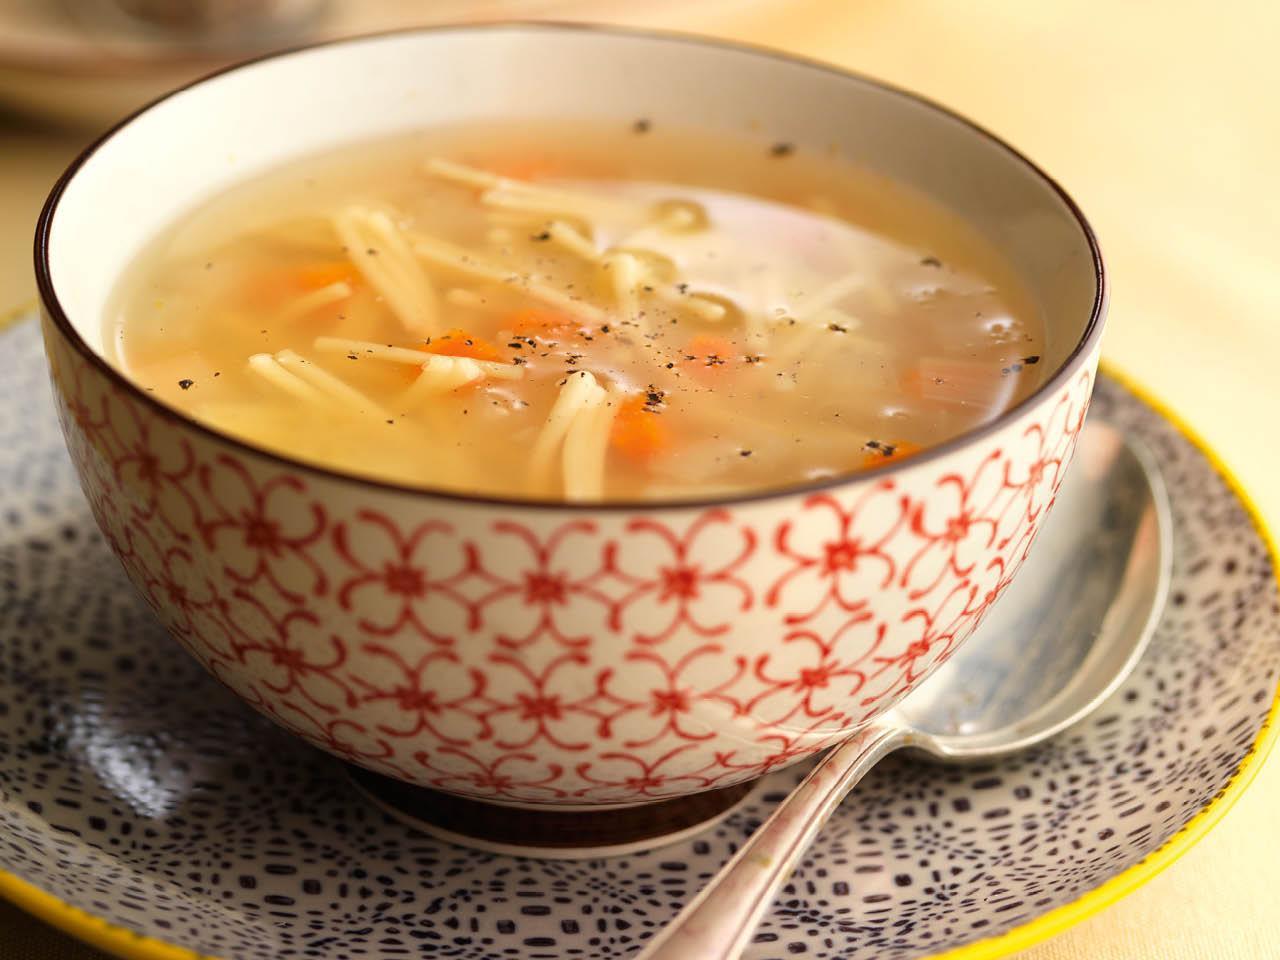 que comer hoy sopa fideos